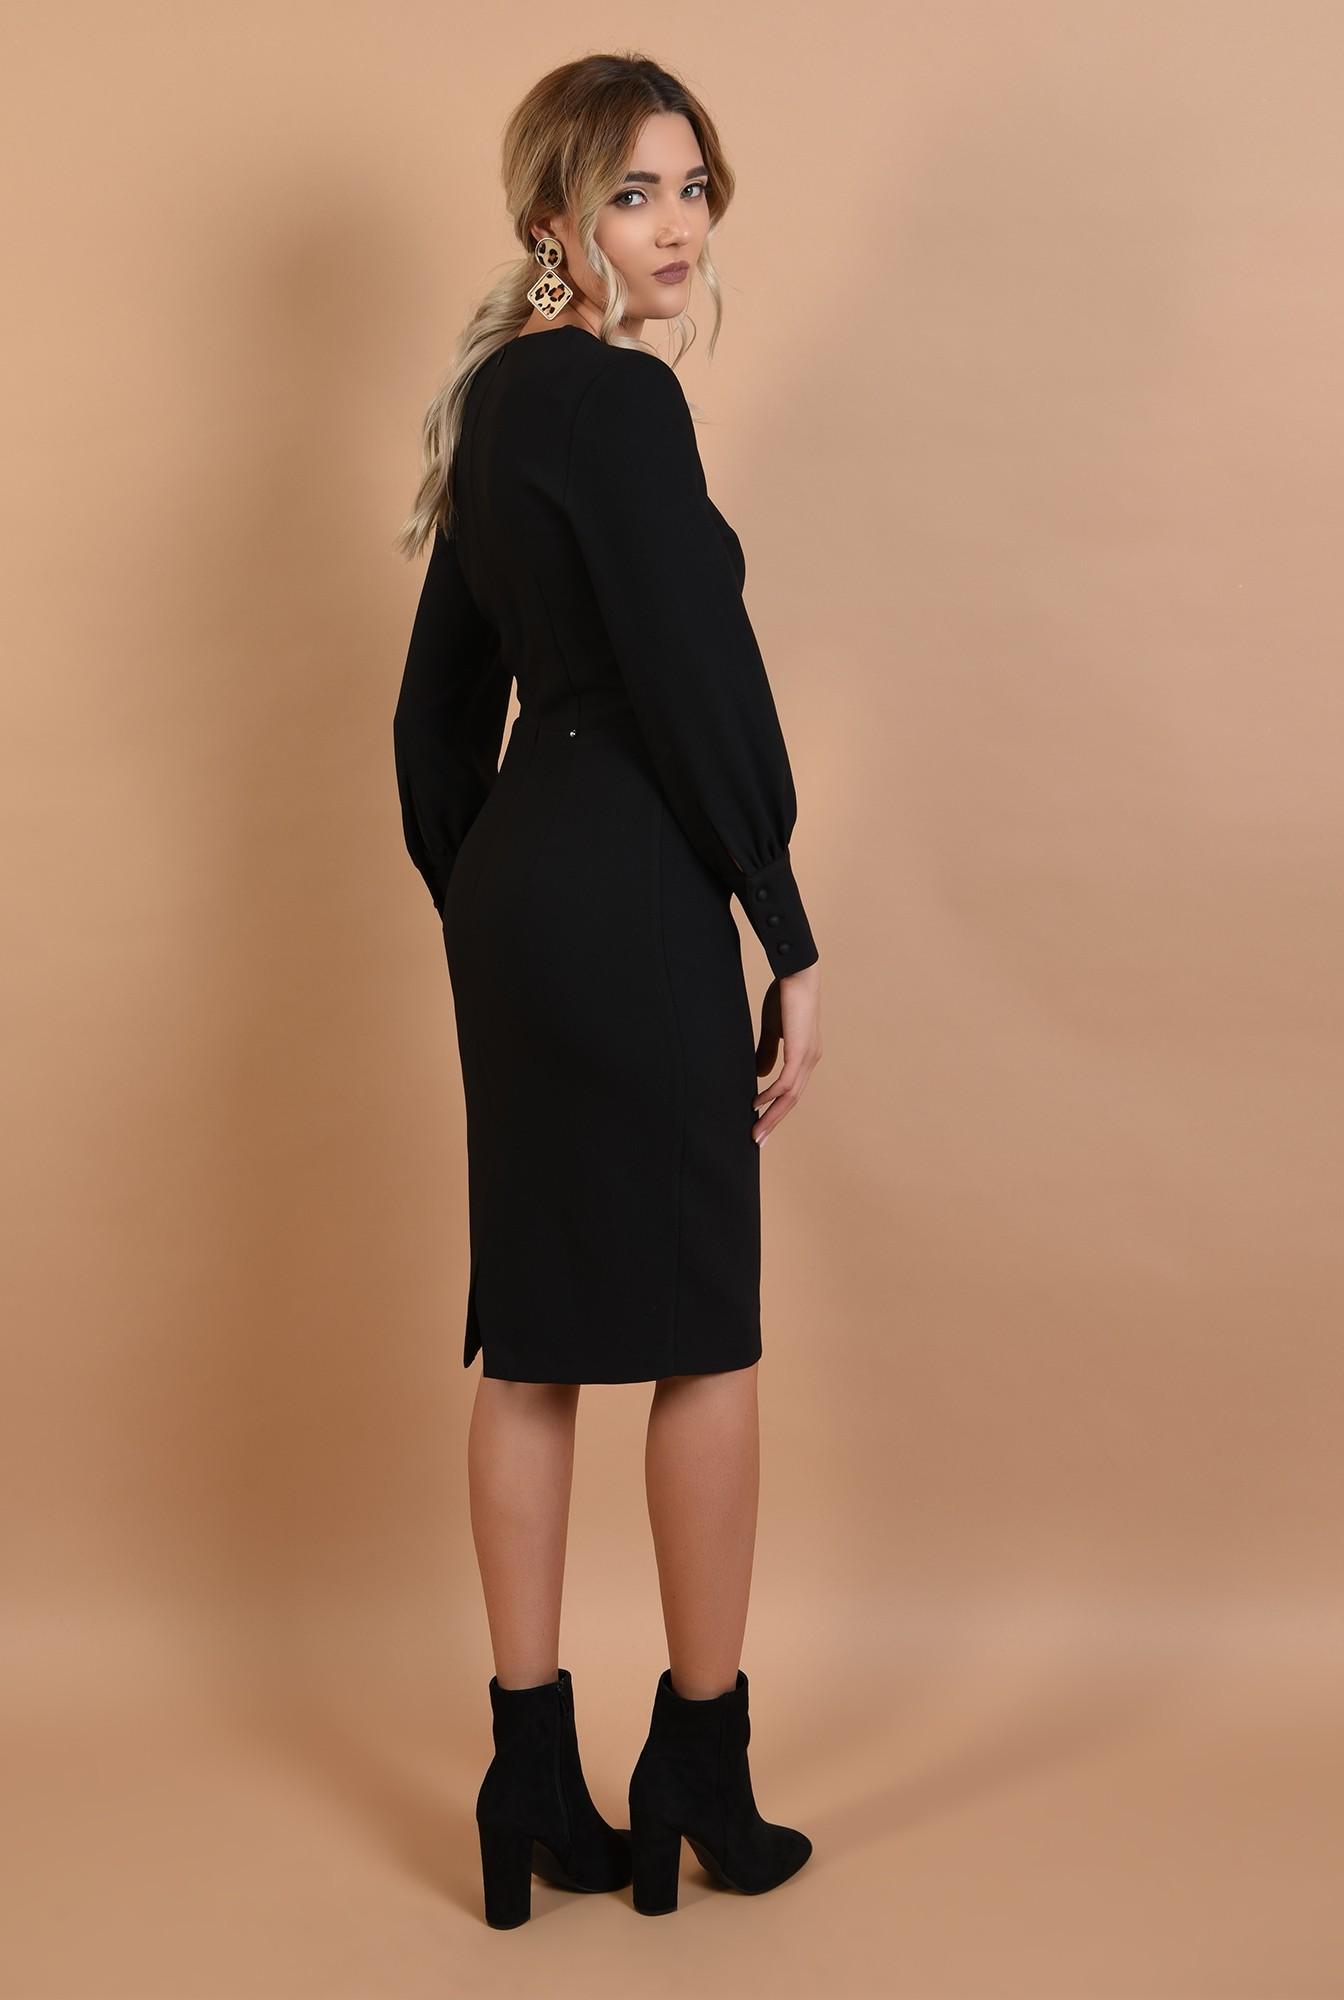 1 - rochie office, neagra, conica, lungime midi, mansete cu nasturi perla